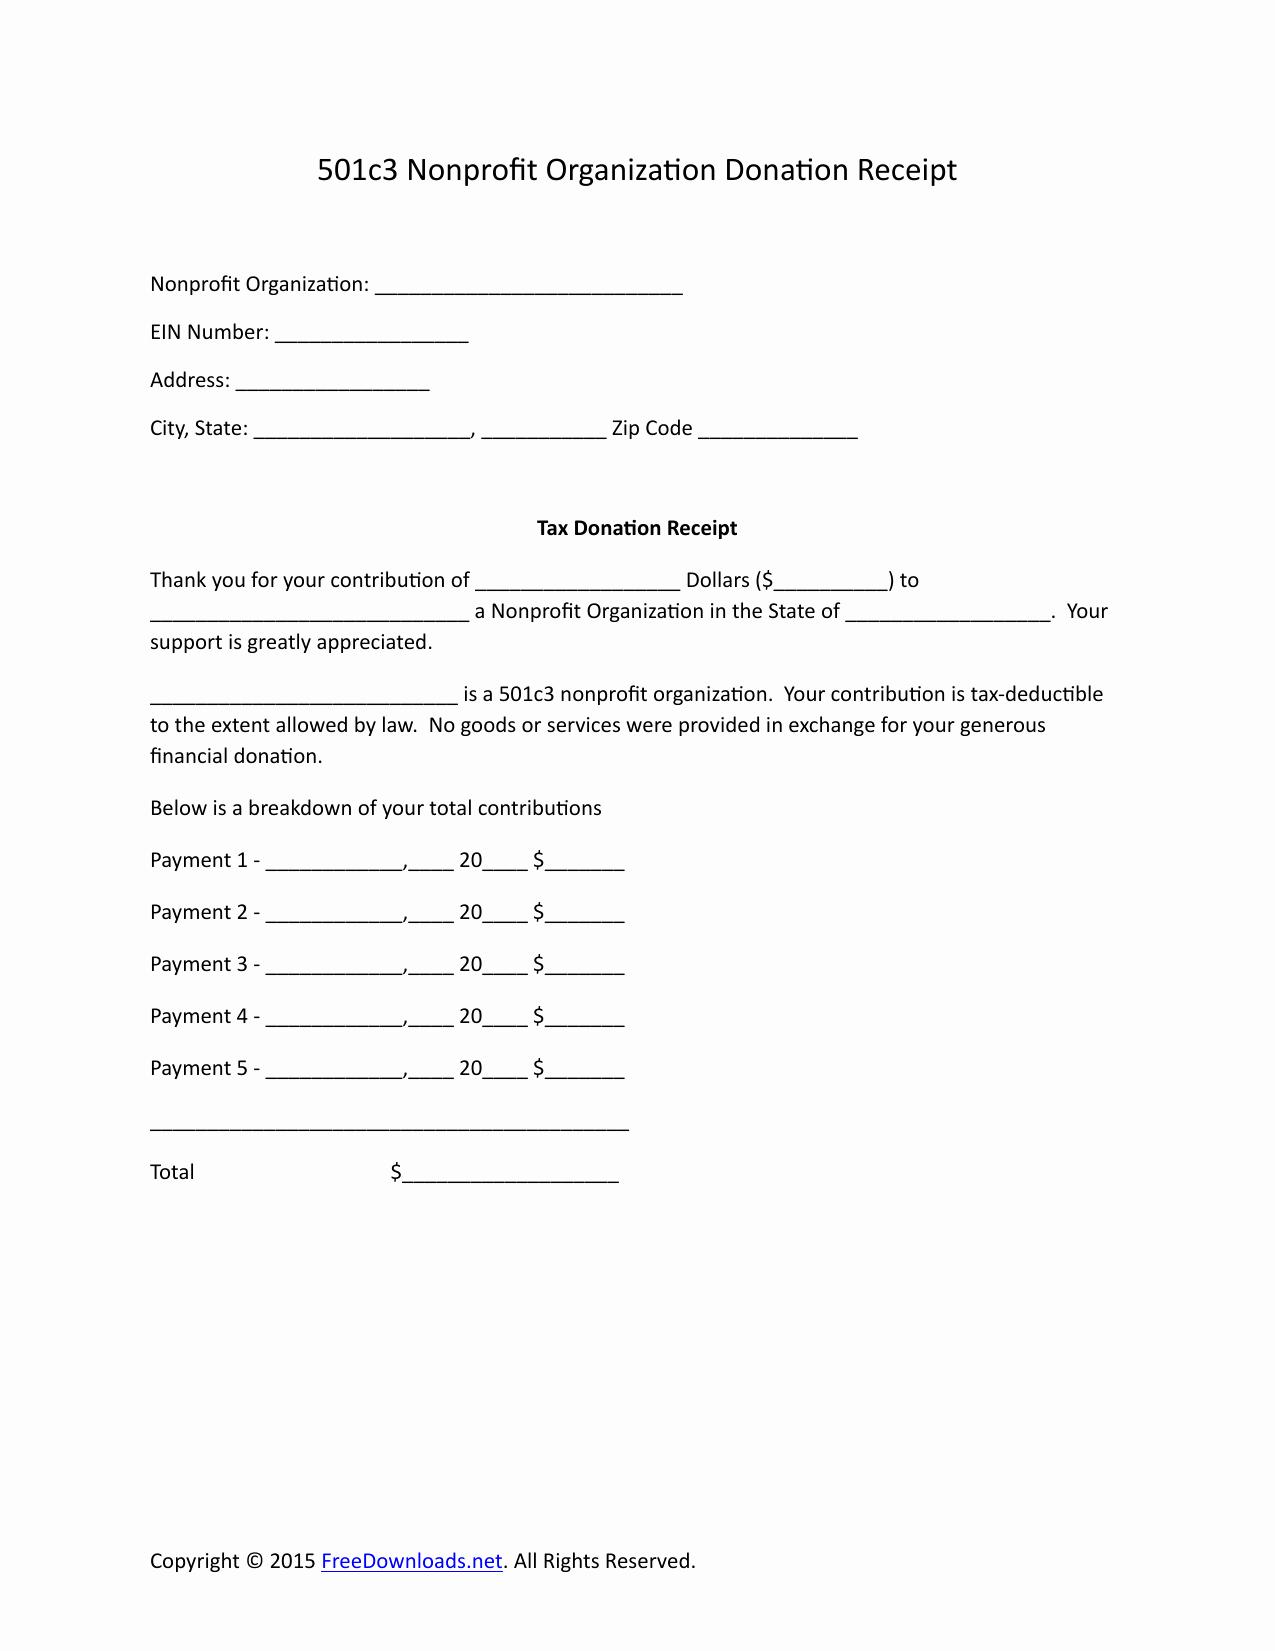 Nonprofit Gift Acknowledgement Letter